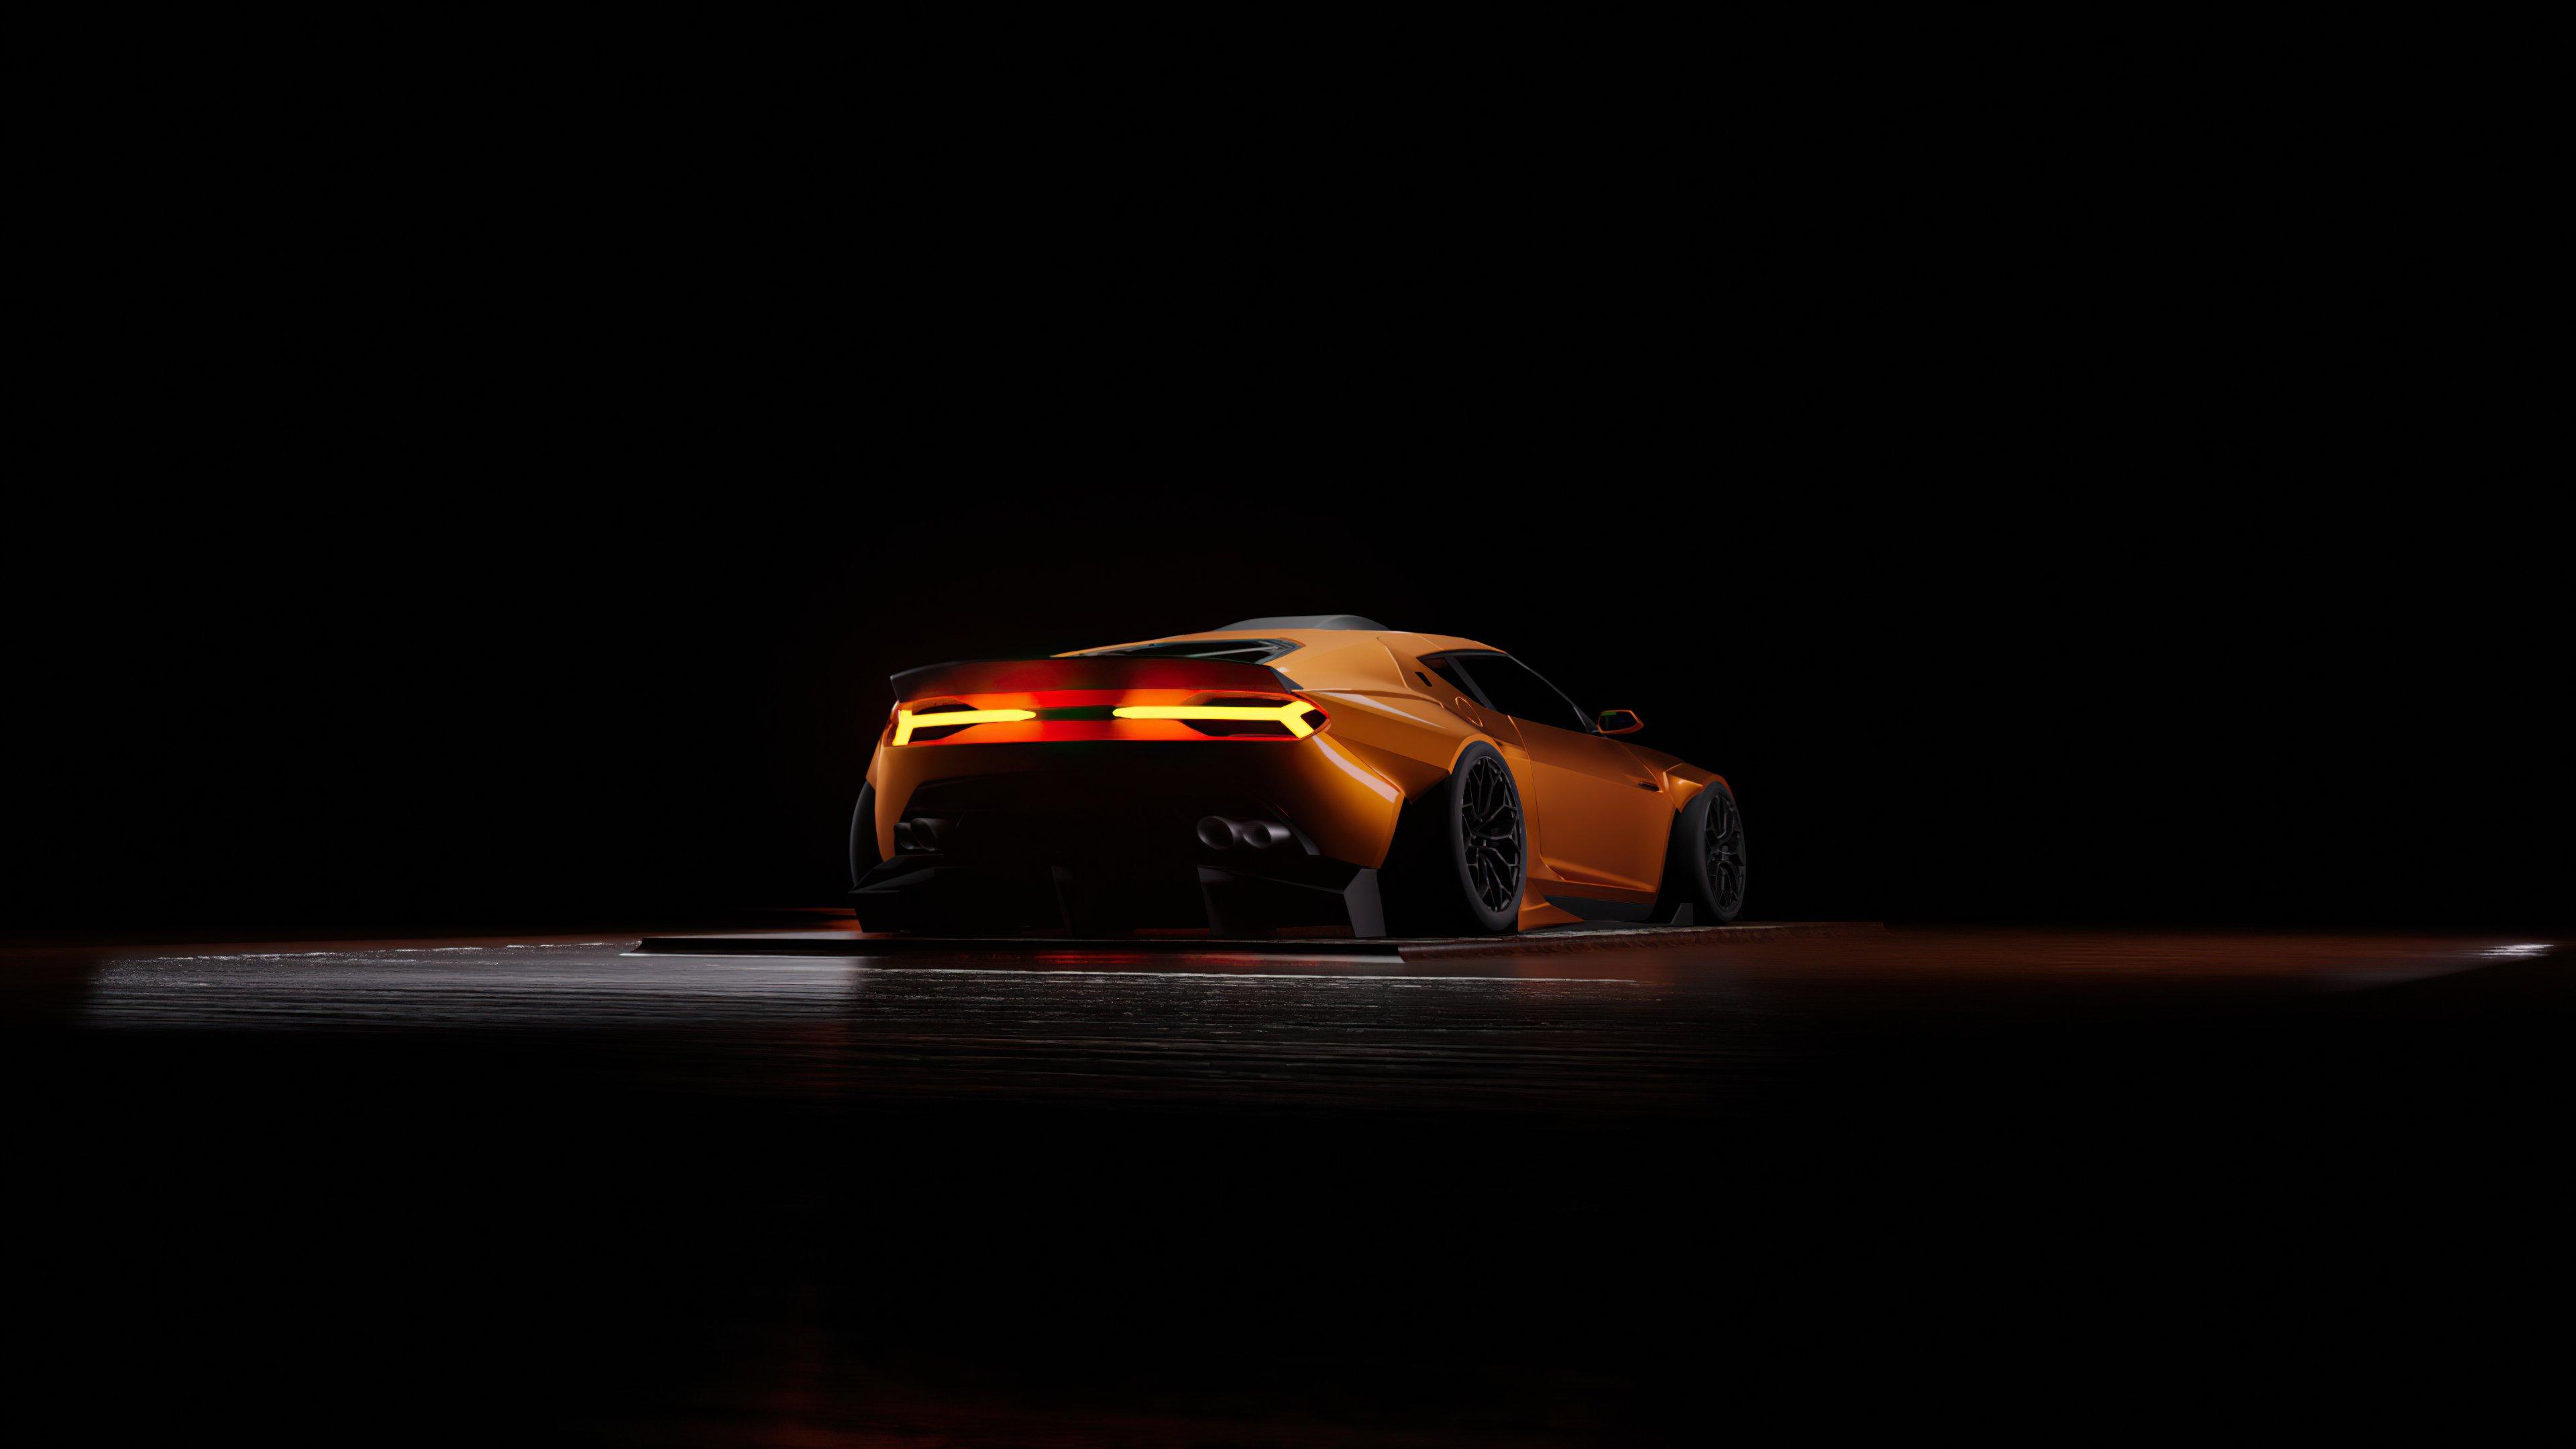 Wallpaper Lamborghini Asterion